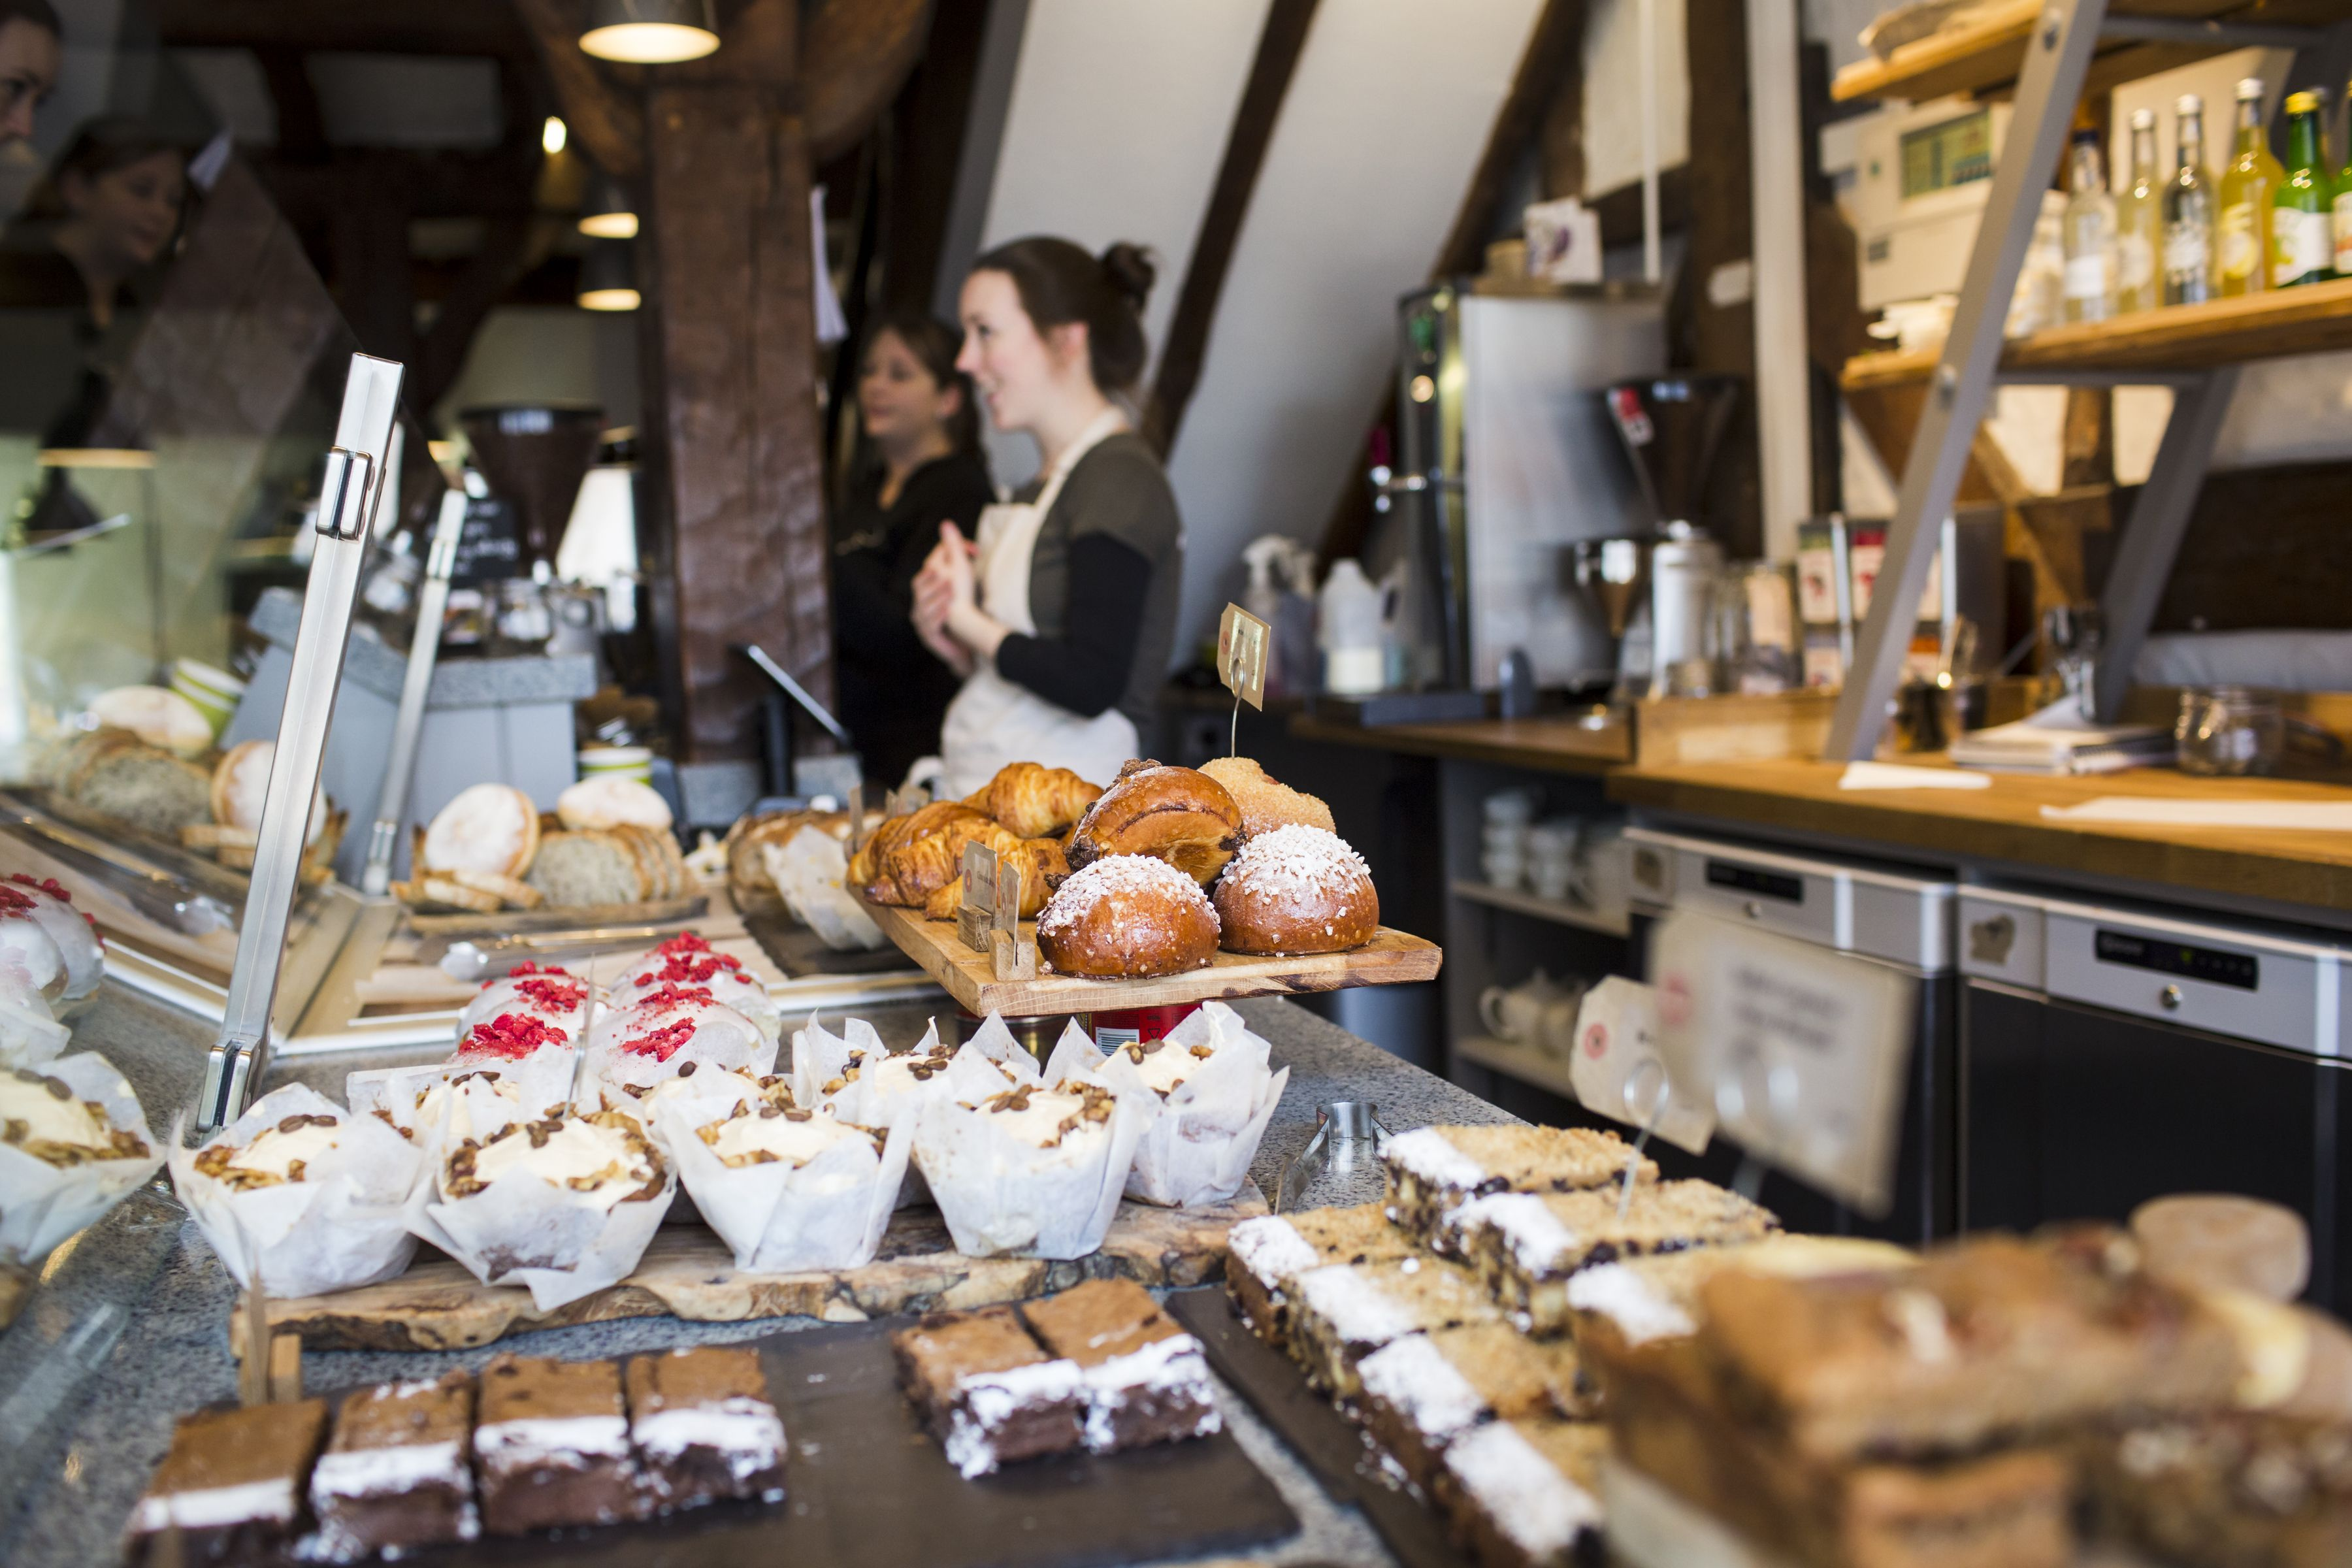 Artisan bakery and patisserie in Tonbridge, Kent ...